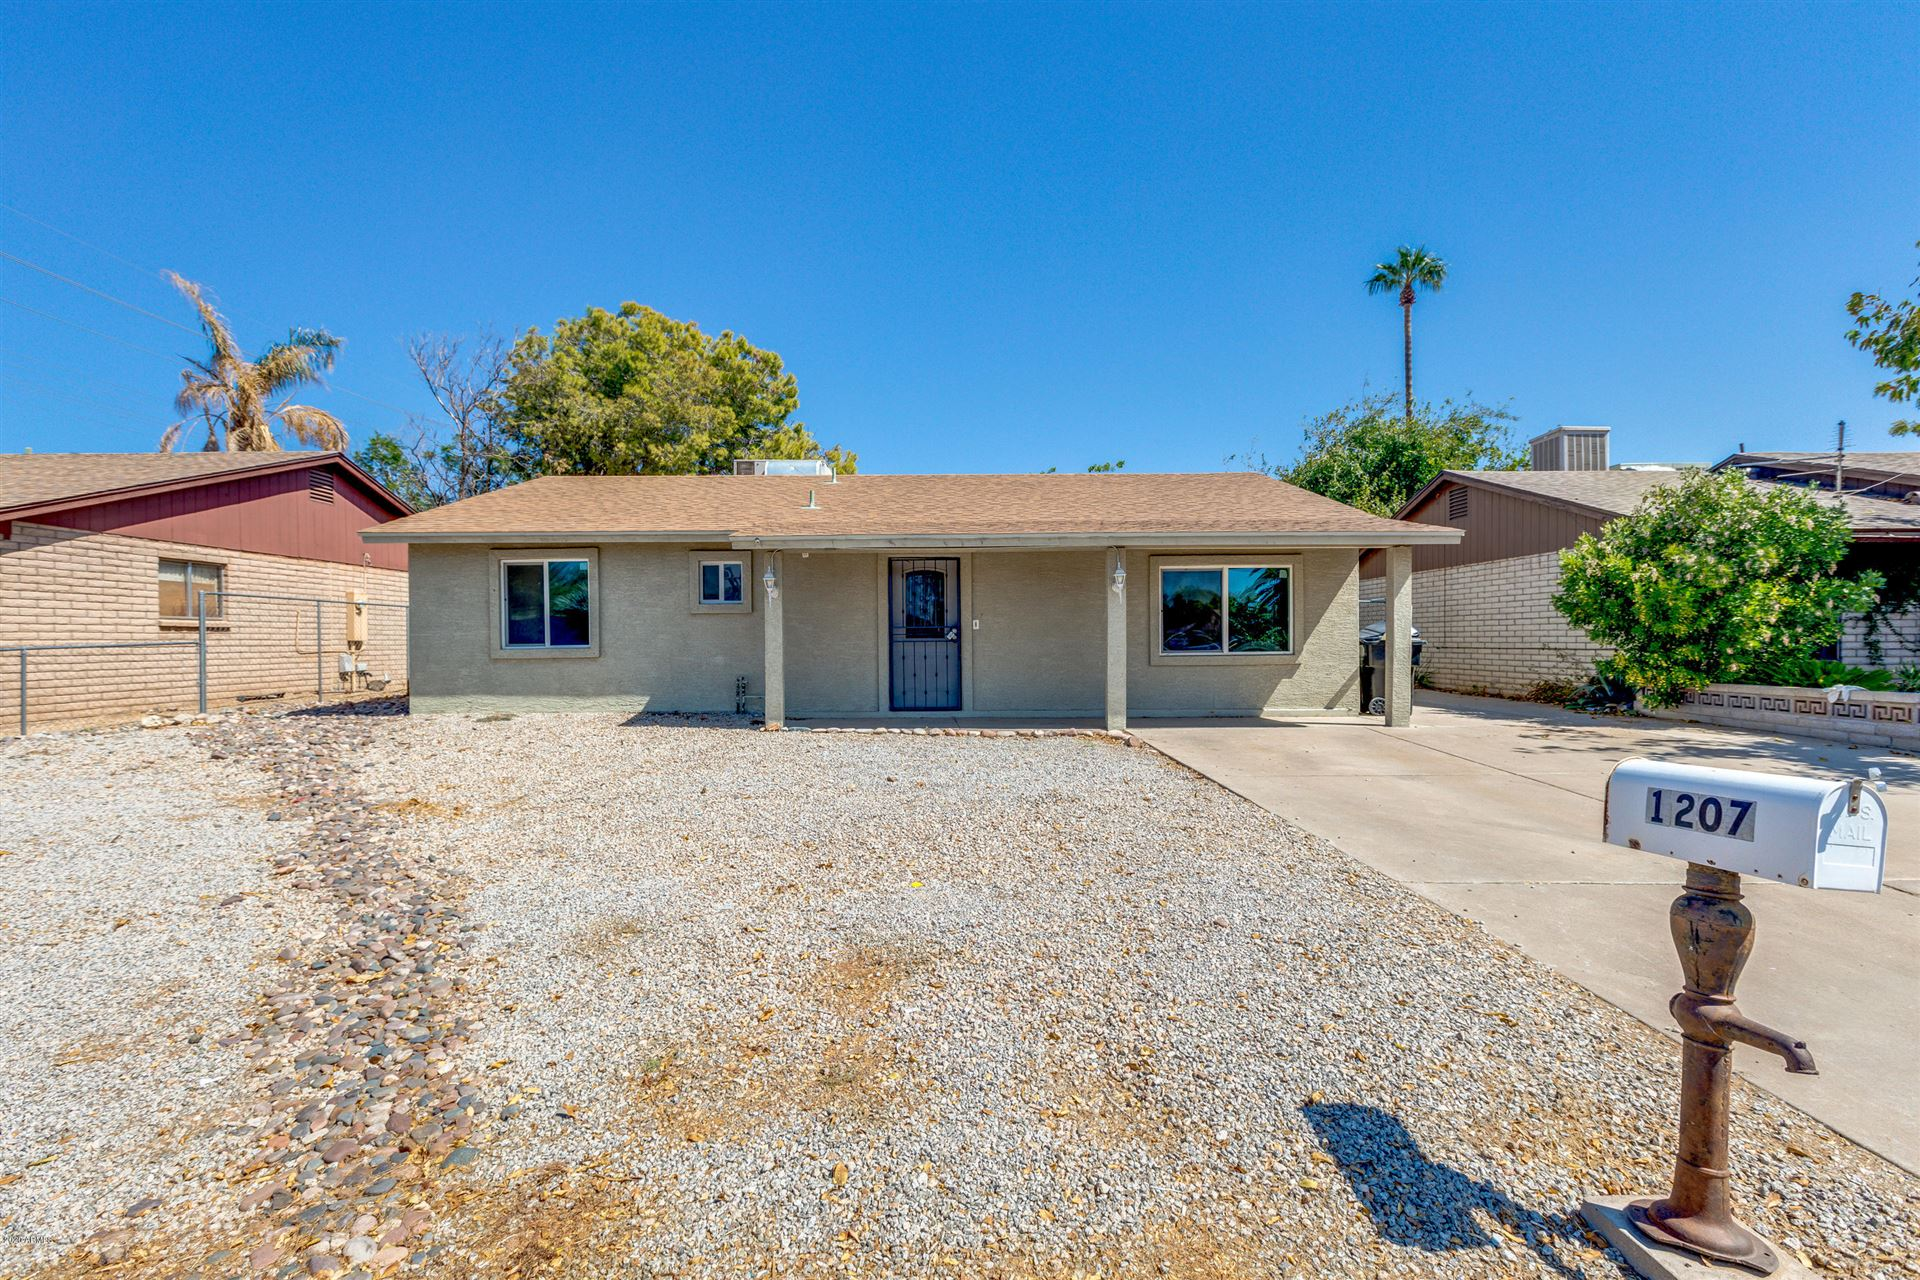 1207 S 80TH Street, Mesa, AZ 85209 - MLS#: 6138802